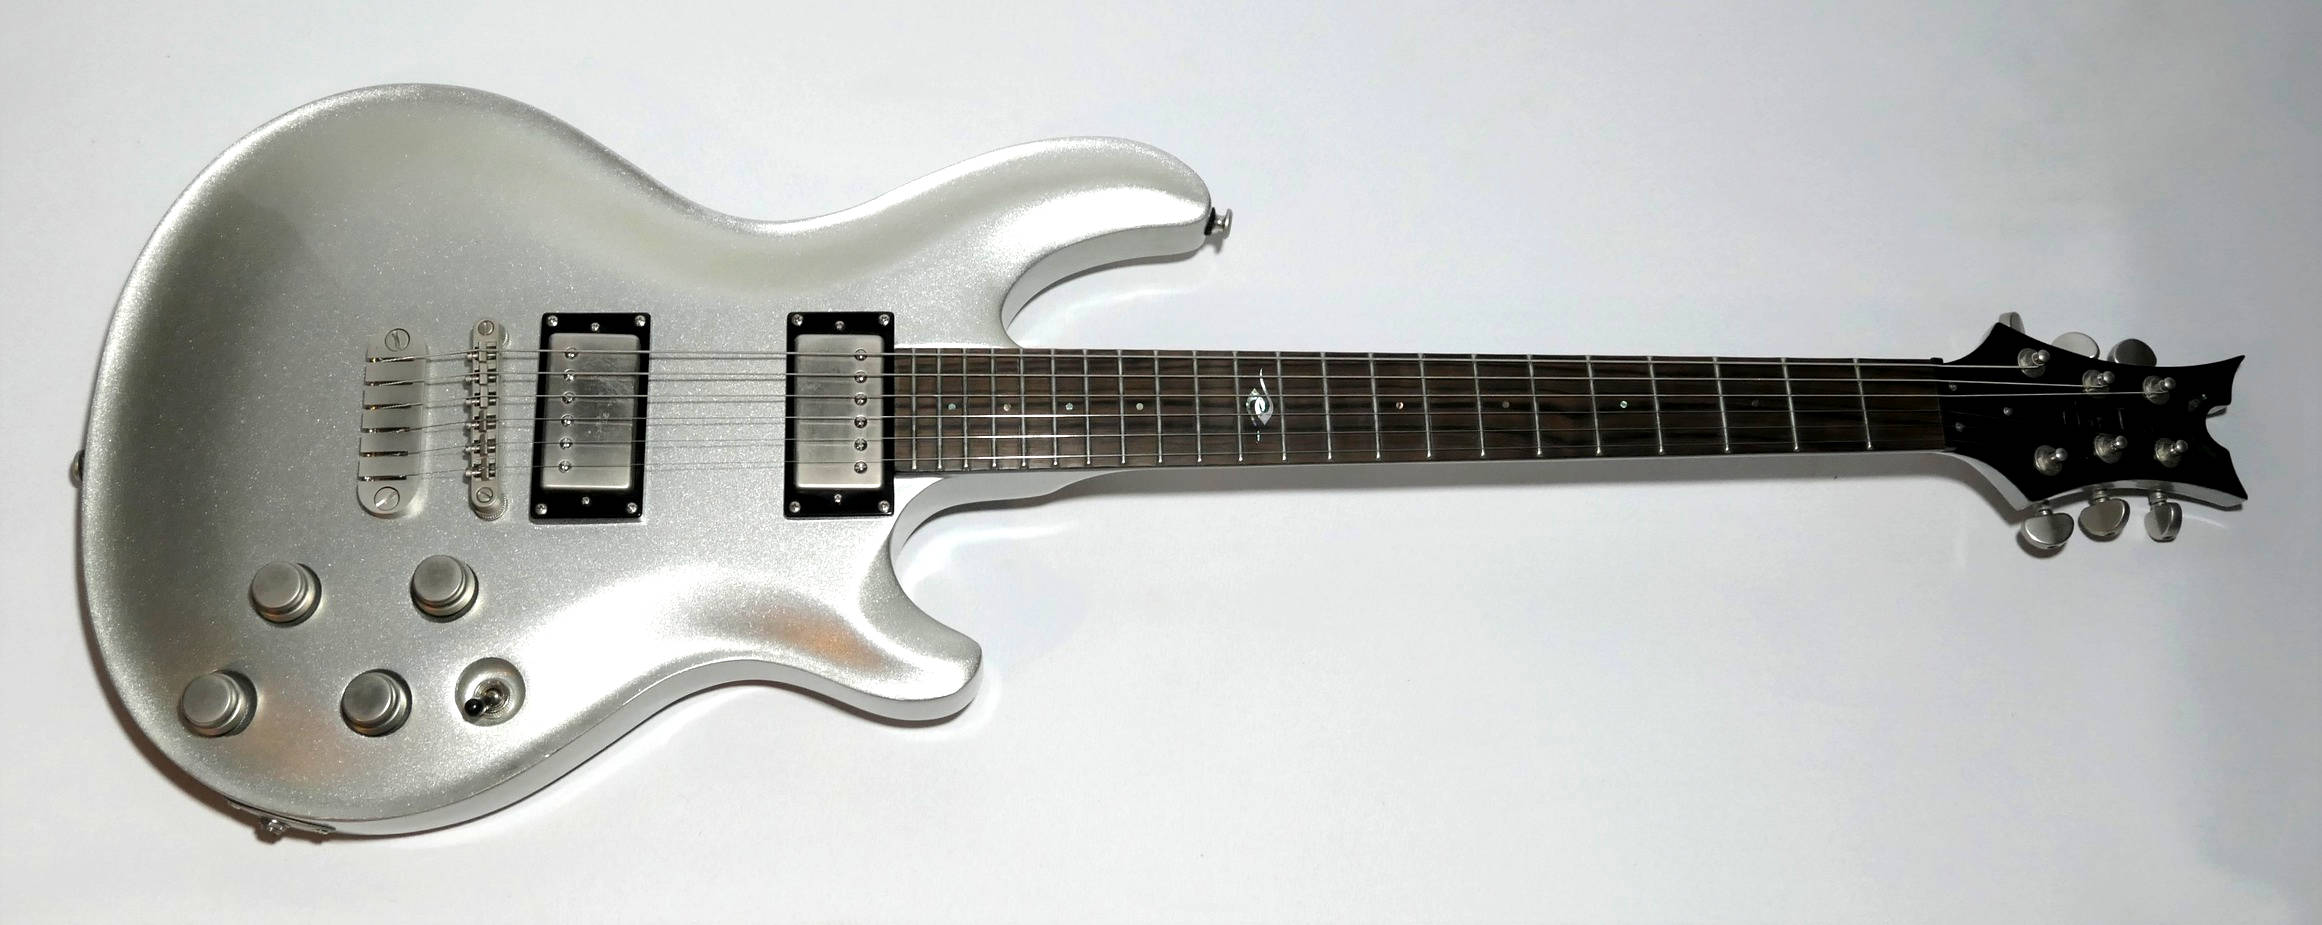 E-Gitarre DEAN Hardtail silver sparkle